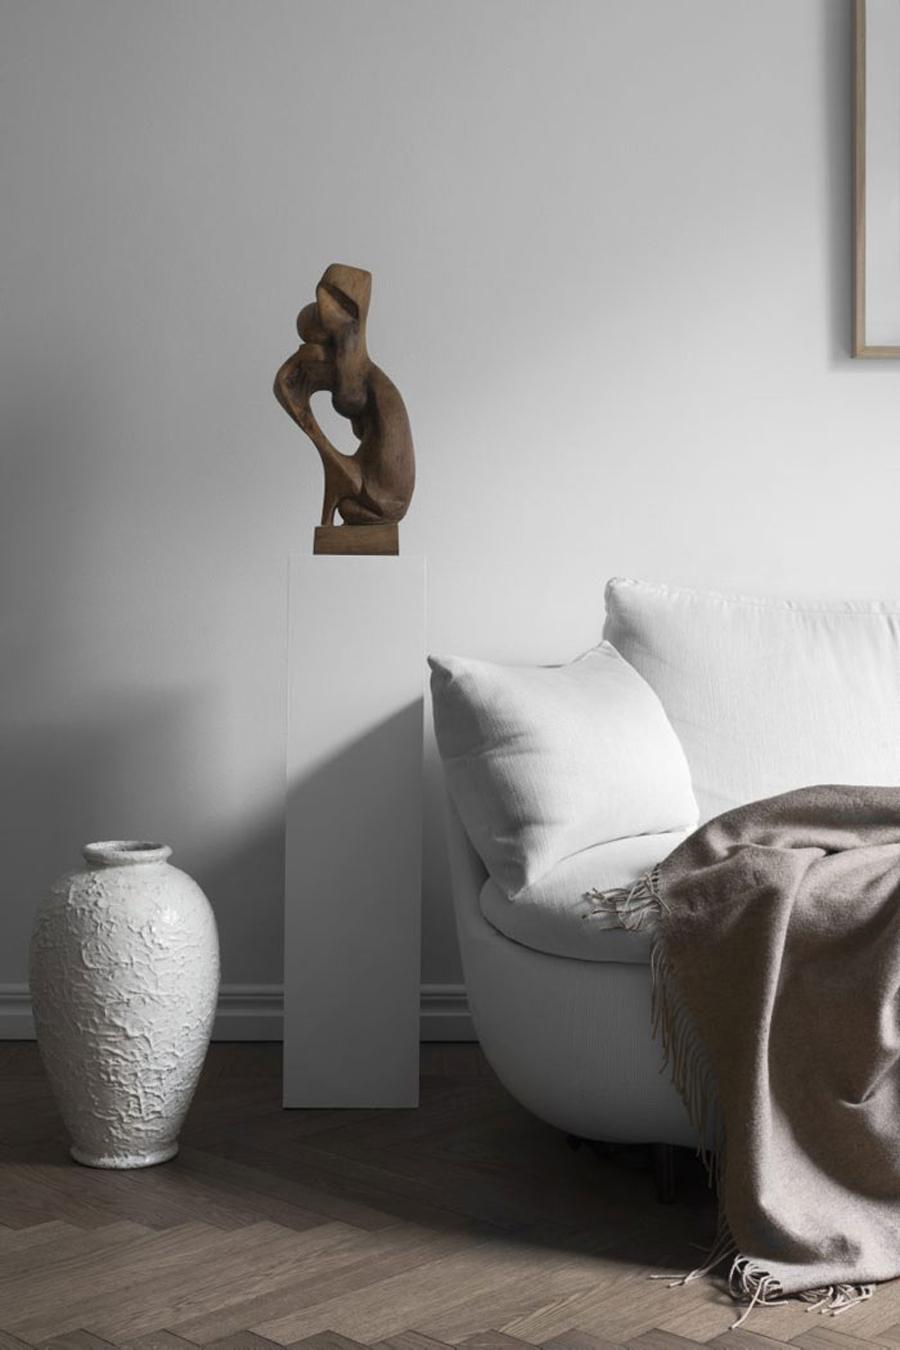 claes-juhlin-minimalism-art-home-2